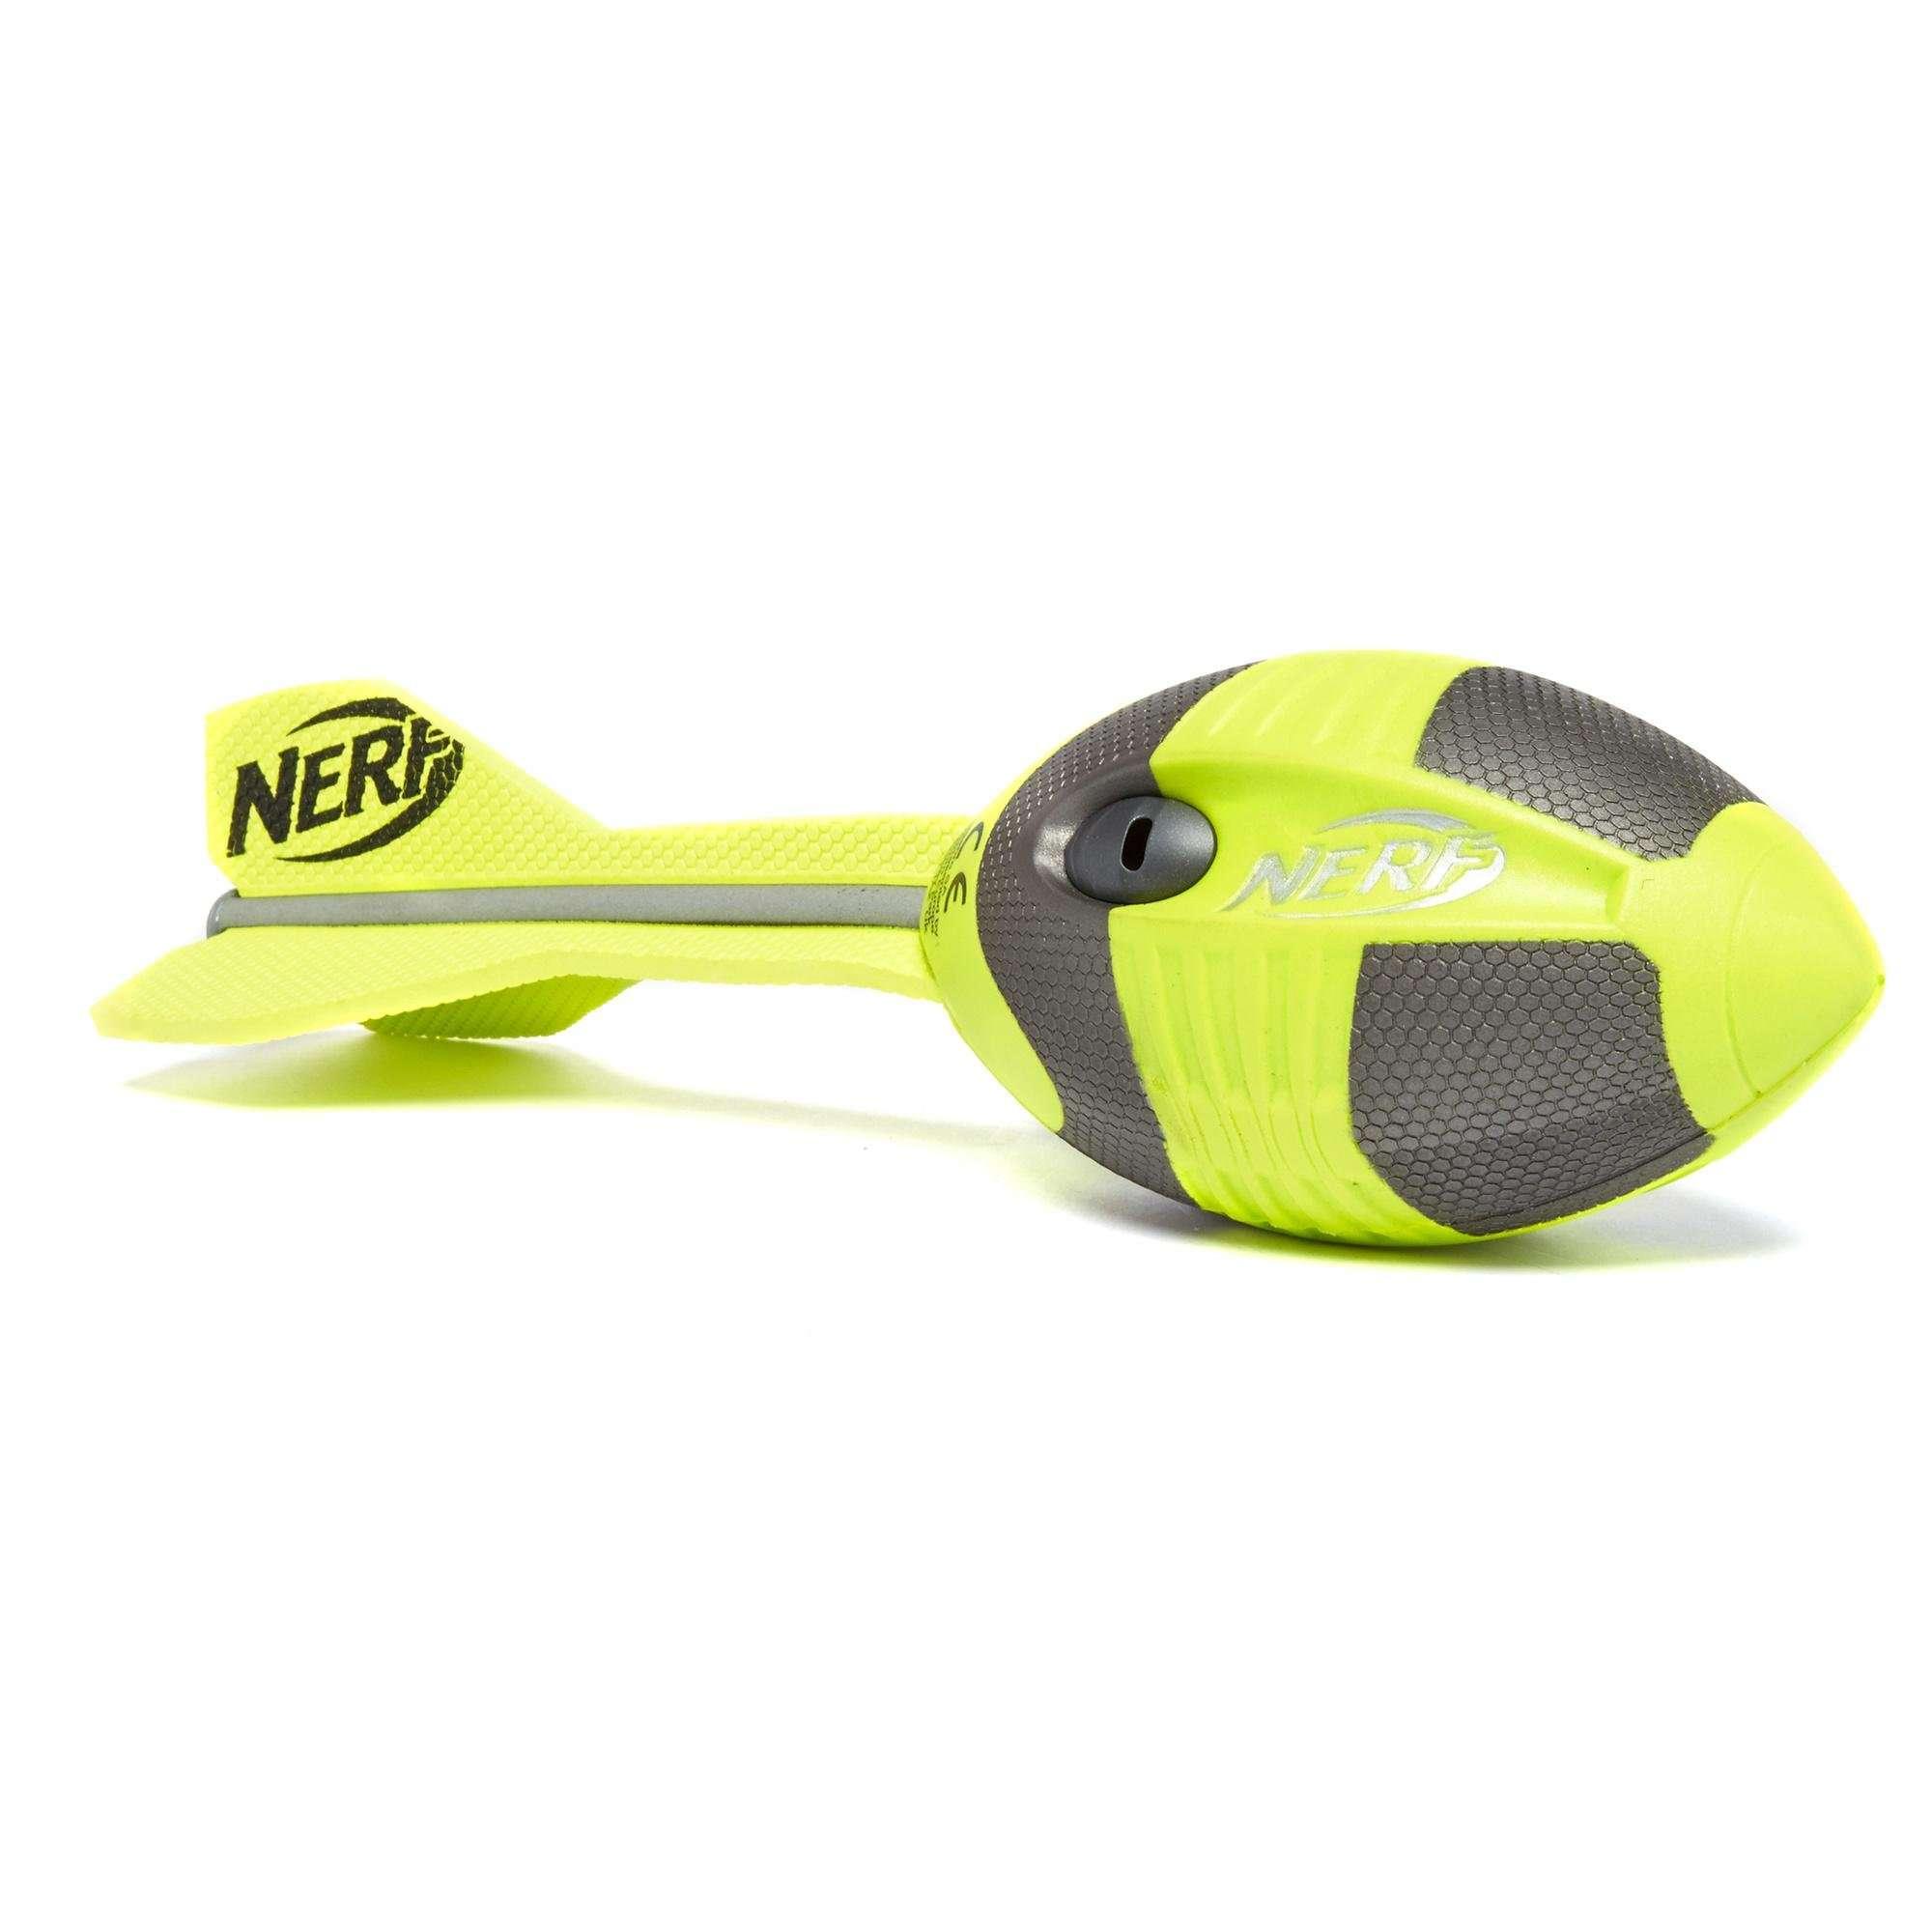 NERF N-Sports Vortex Aero Howler Football